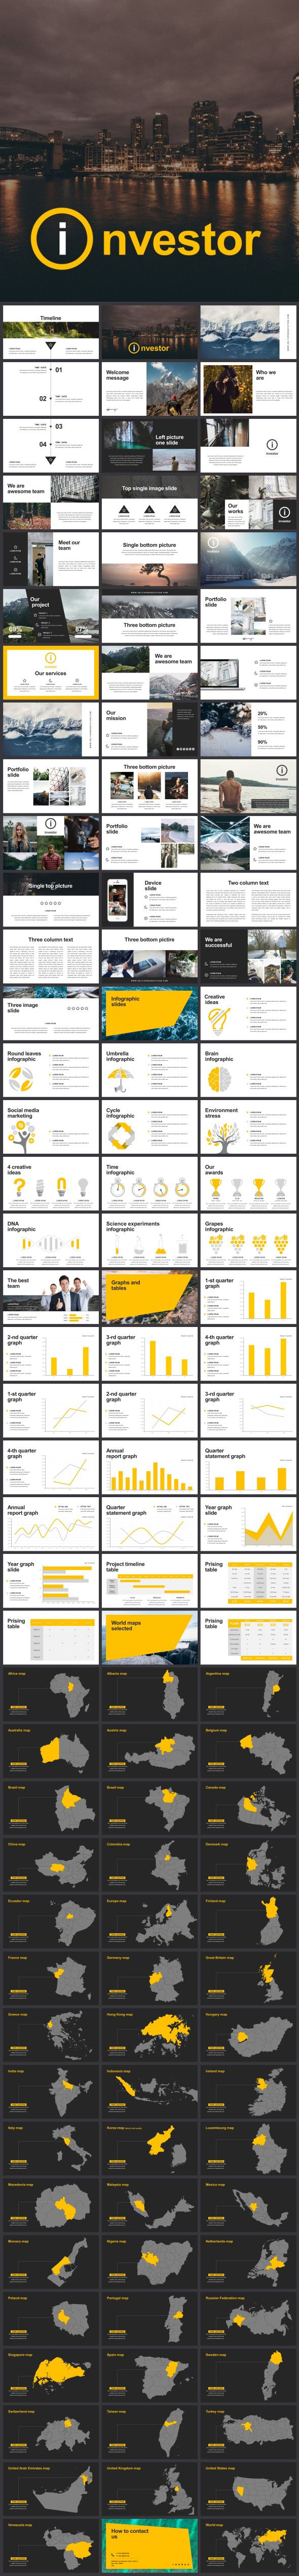 Investor Keynote Template 42 best templates